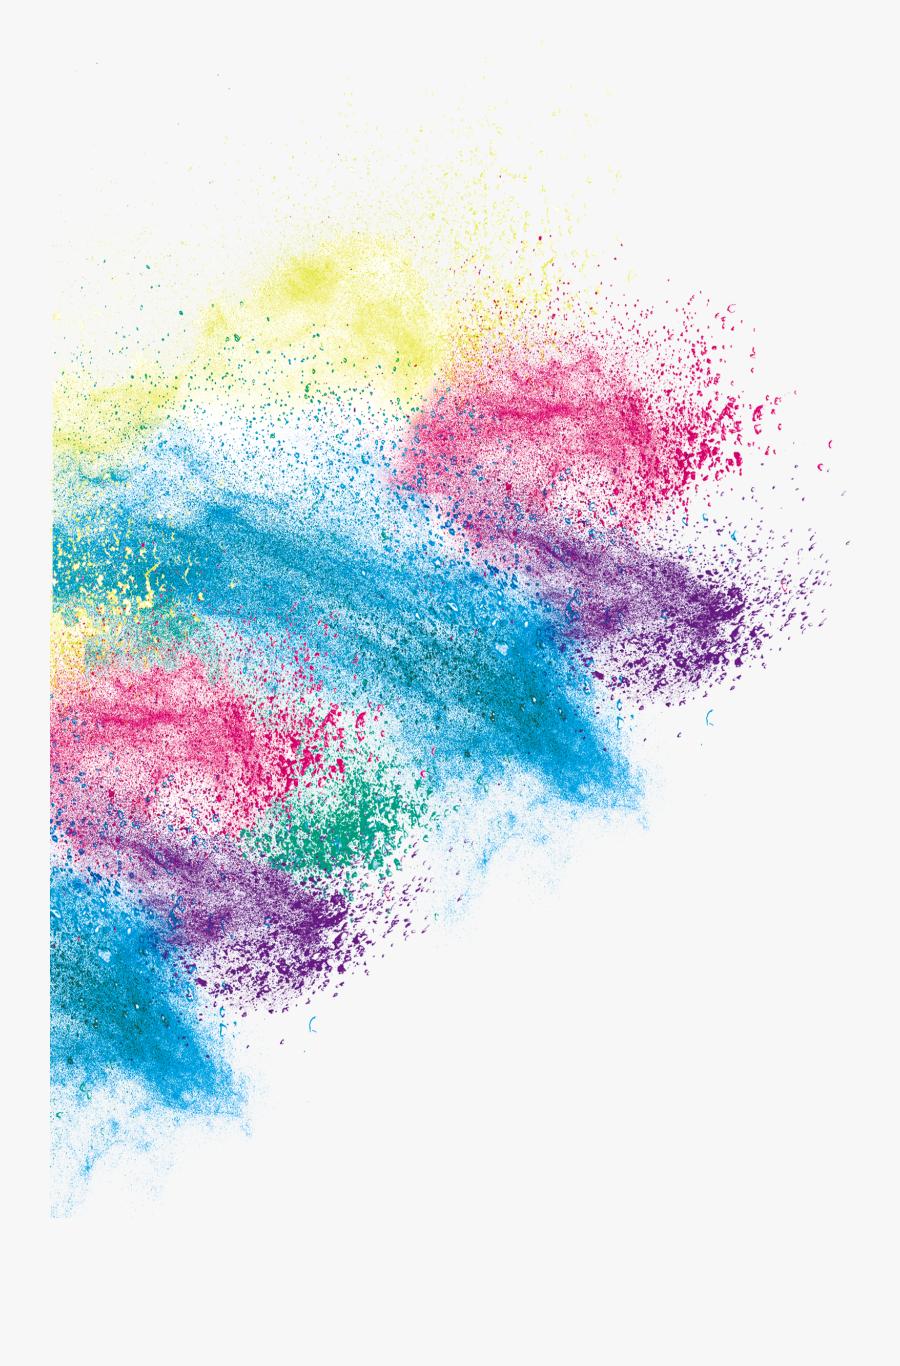 Art Inkjet Color Effect Creative Printing Dust Clipart - Picsart Holi Color Png, Transparent Clipart